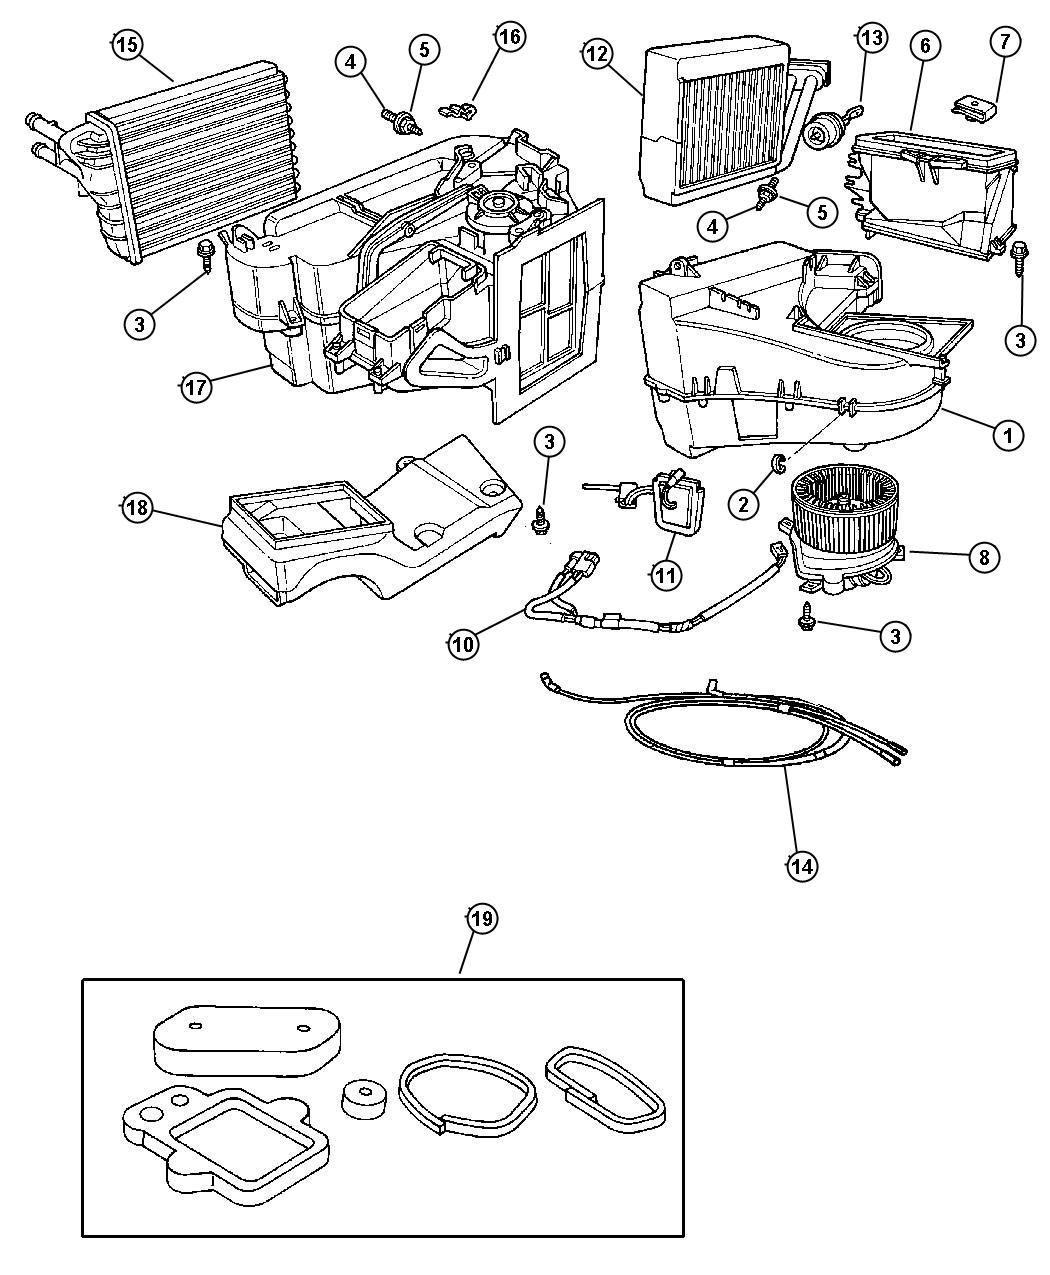 Air Conditioning Unit: Air Conditioning Unit Parts